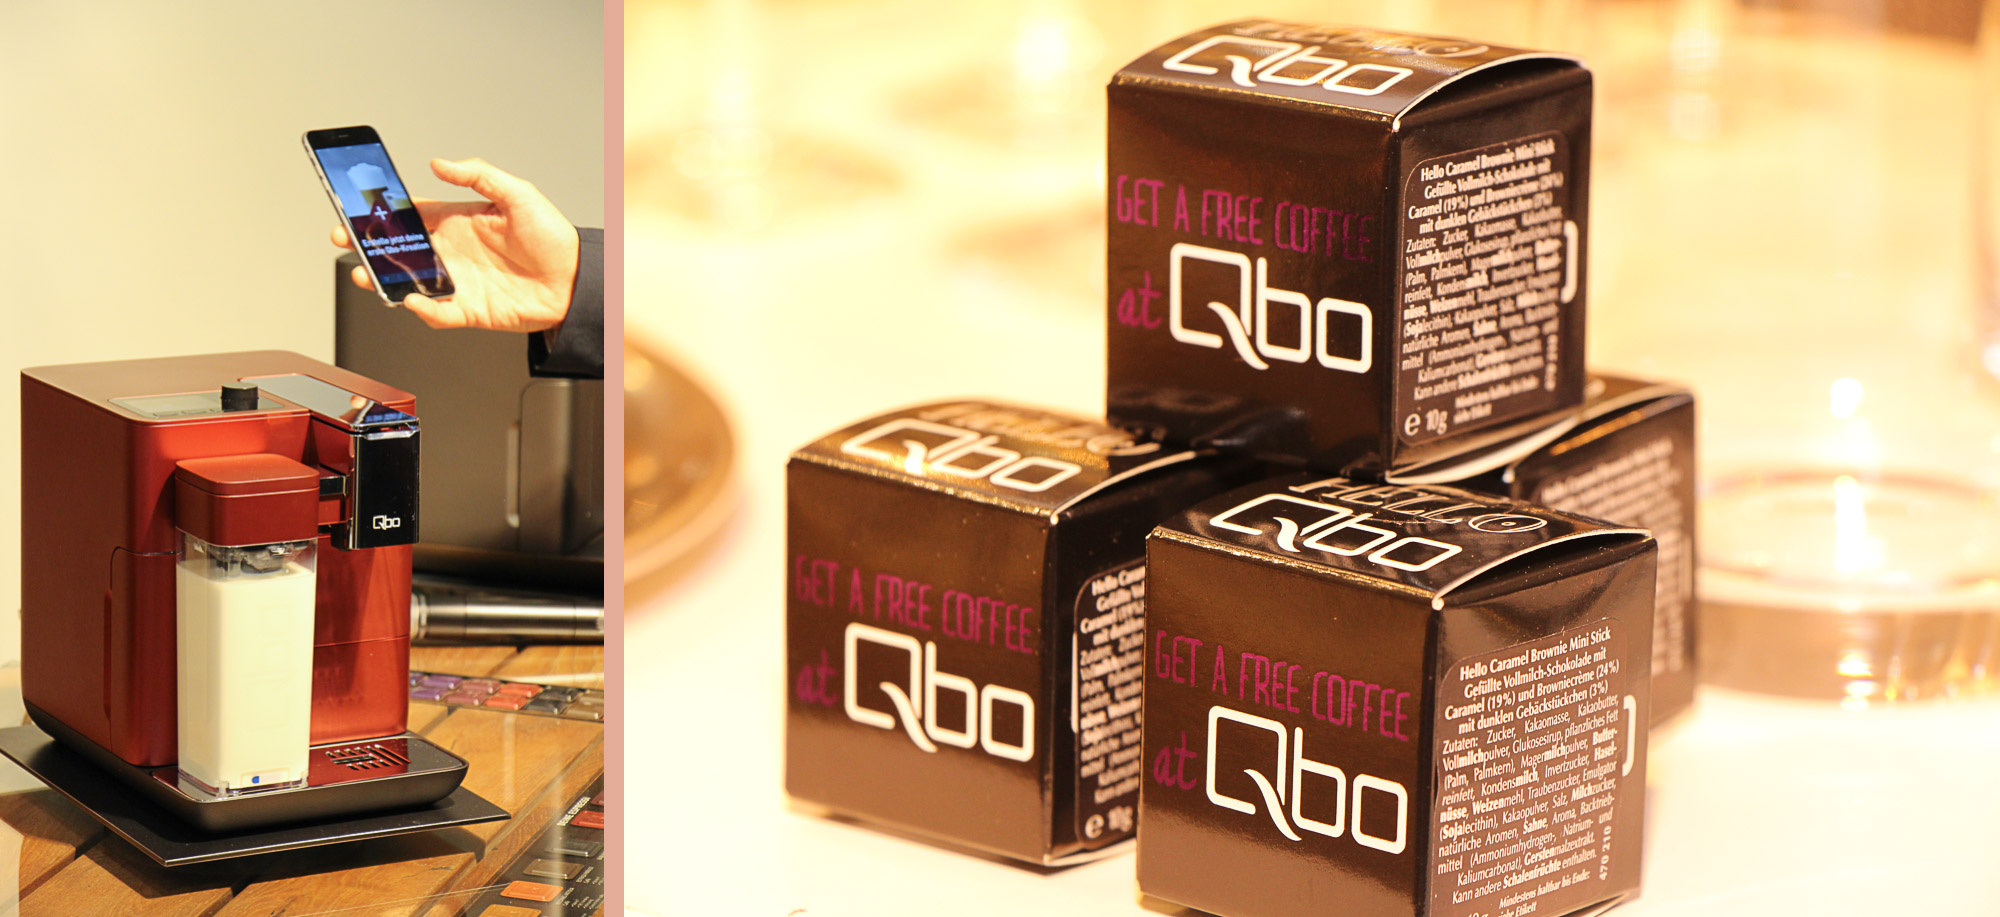 LIFESTYLE: I love Coffee und seit dieser Woche bin ich QBO Fan, Create your Coffee, Kaffee, Espresso, Latte Macchiato, Milchschaum, Premium, QBO, You-Rista, QBO Milk-Master, Barista, Tchibo, Miss Classy, Lifestyleblog, Lifestyleblogger, Graz, Österreich